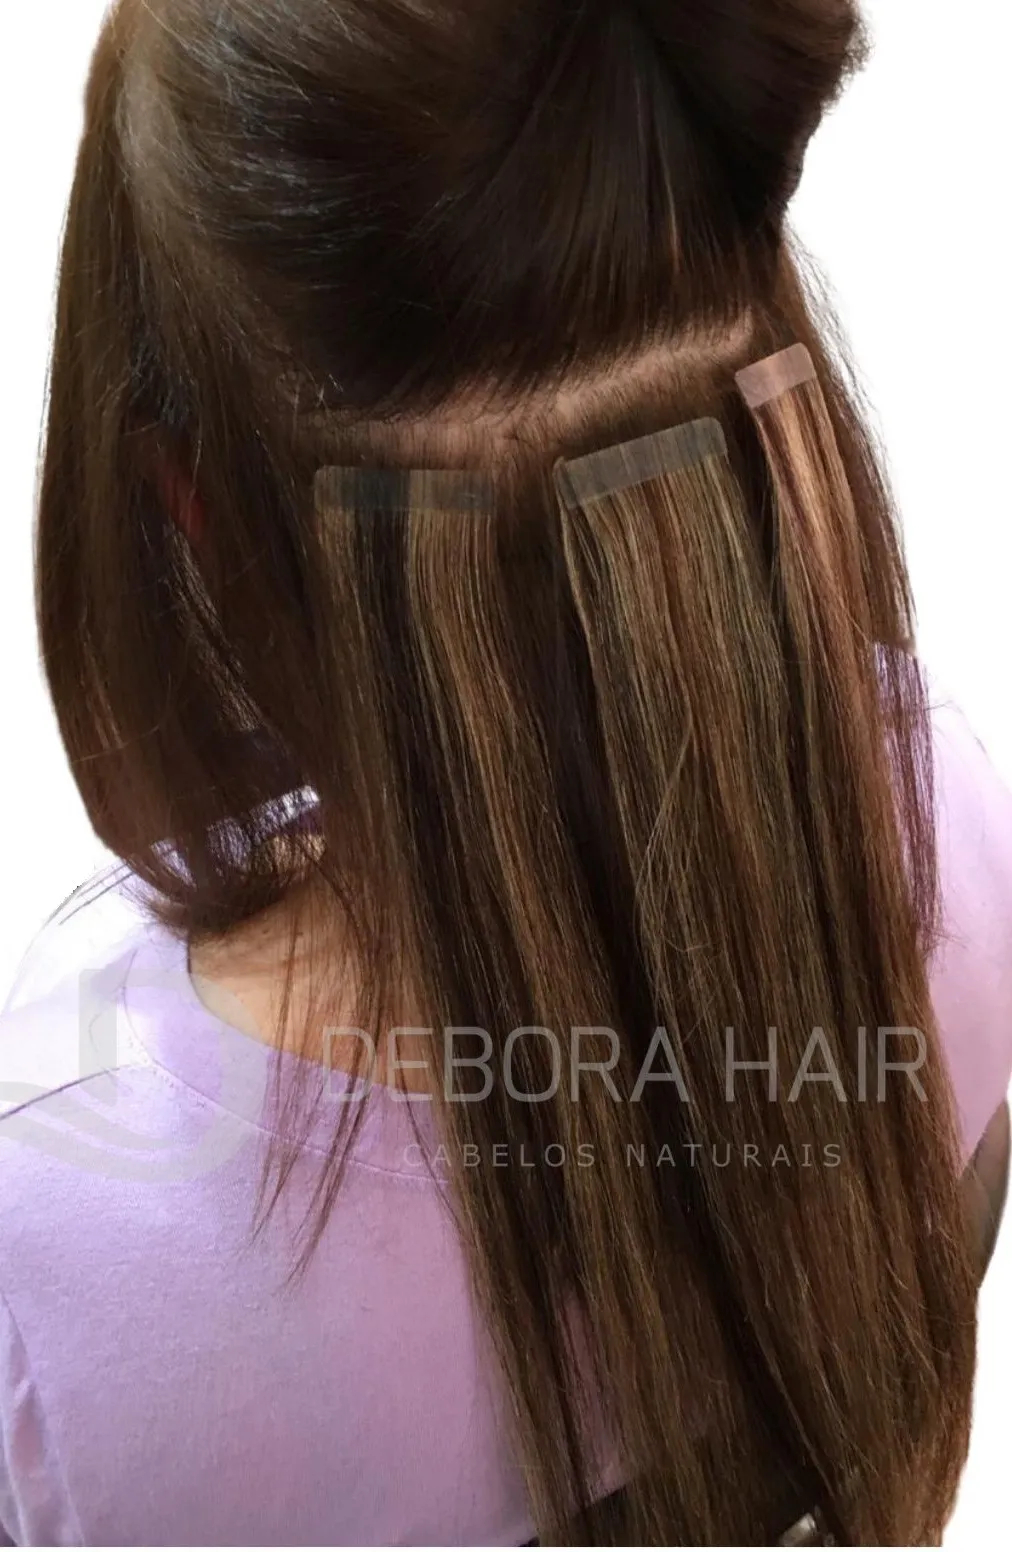 Mega Hair Fita Adesiva 55 cm (SN) N. 1303 20 Peças  - DEBORA HAIR